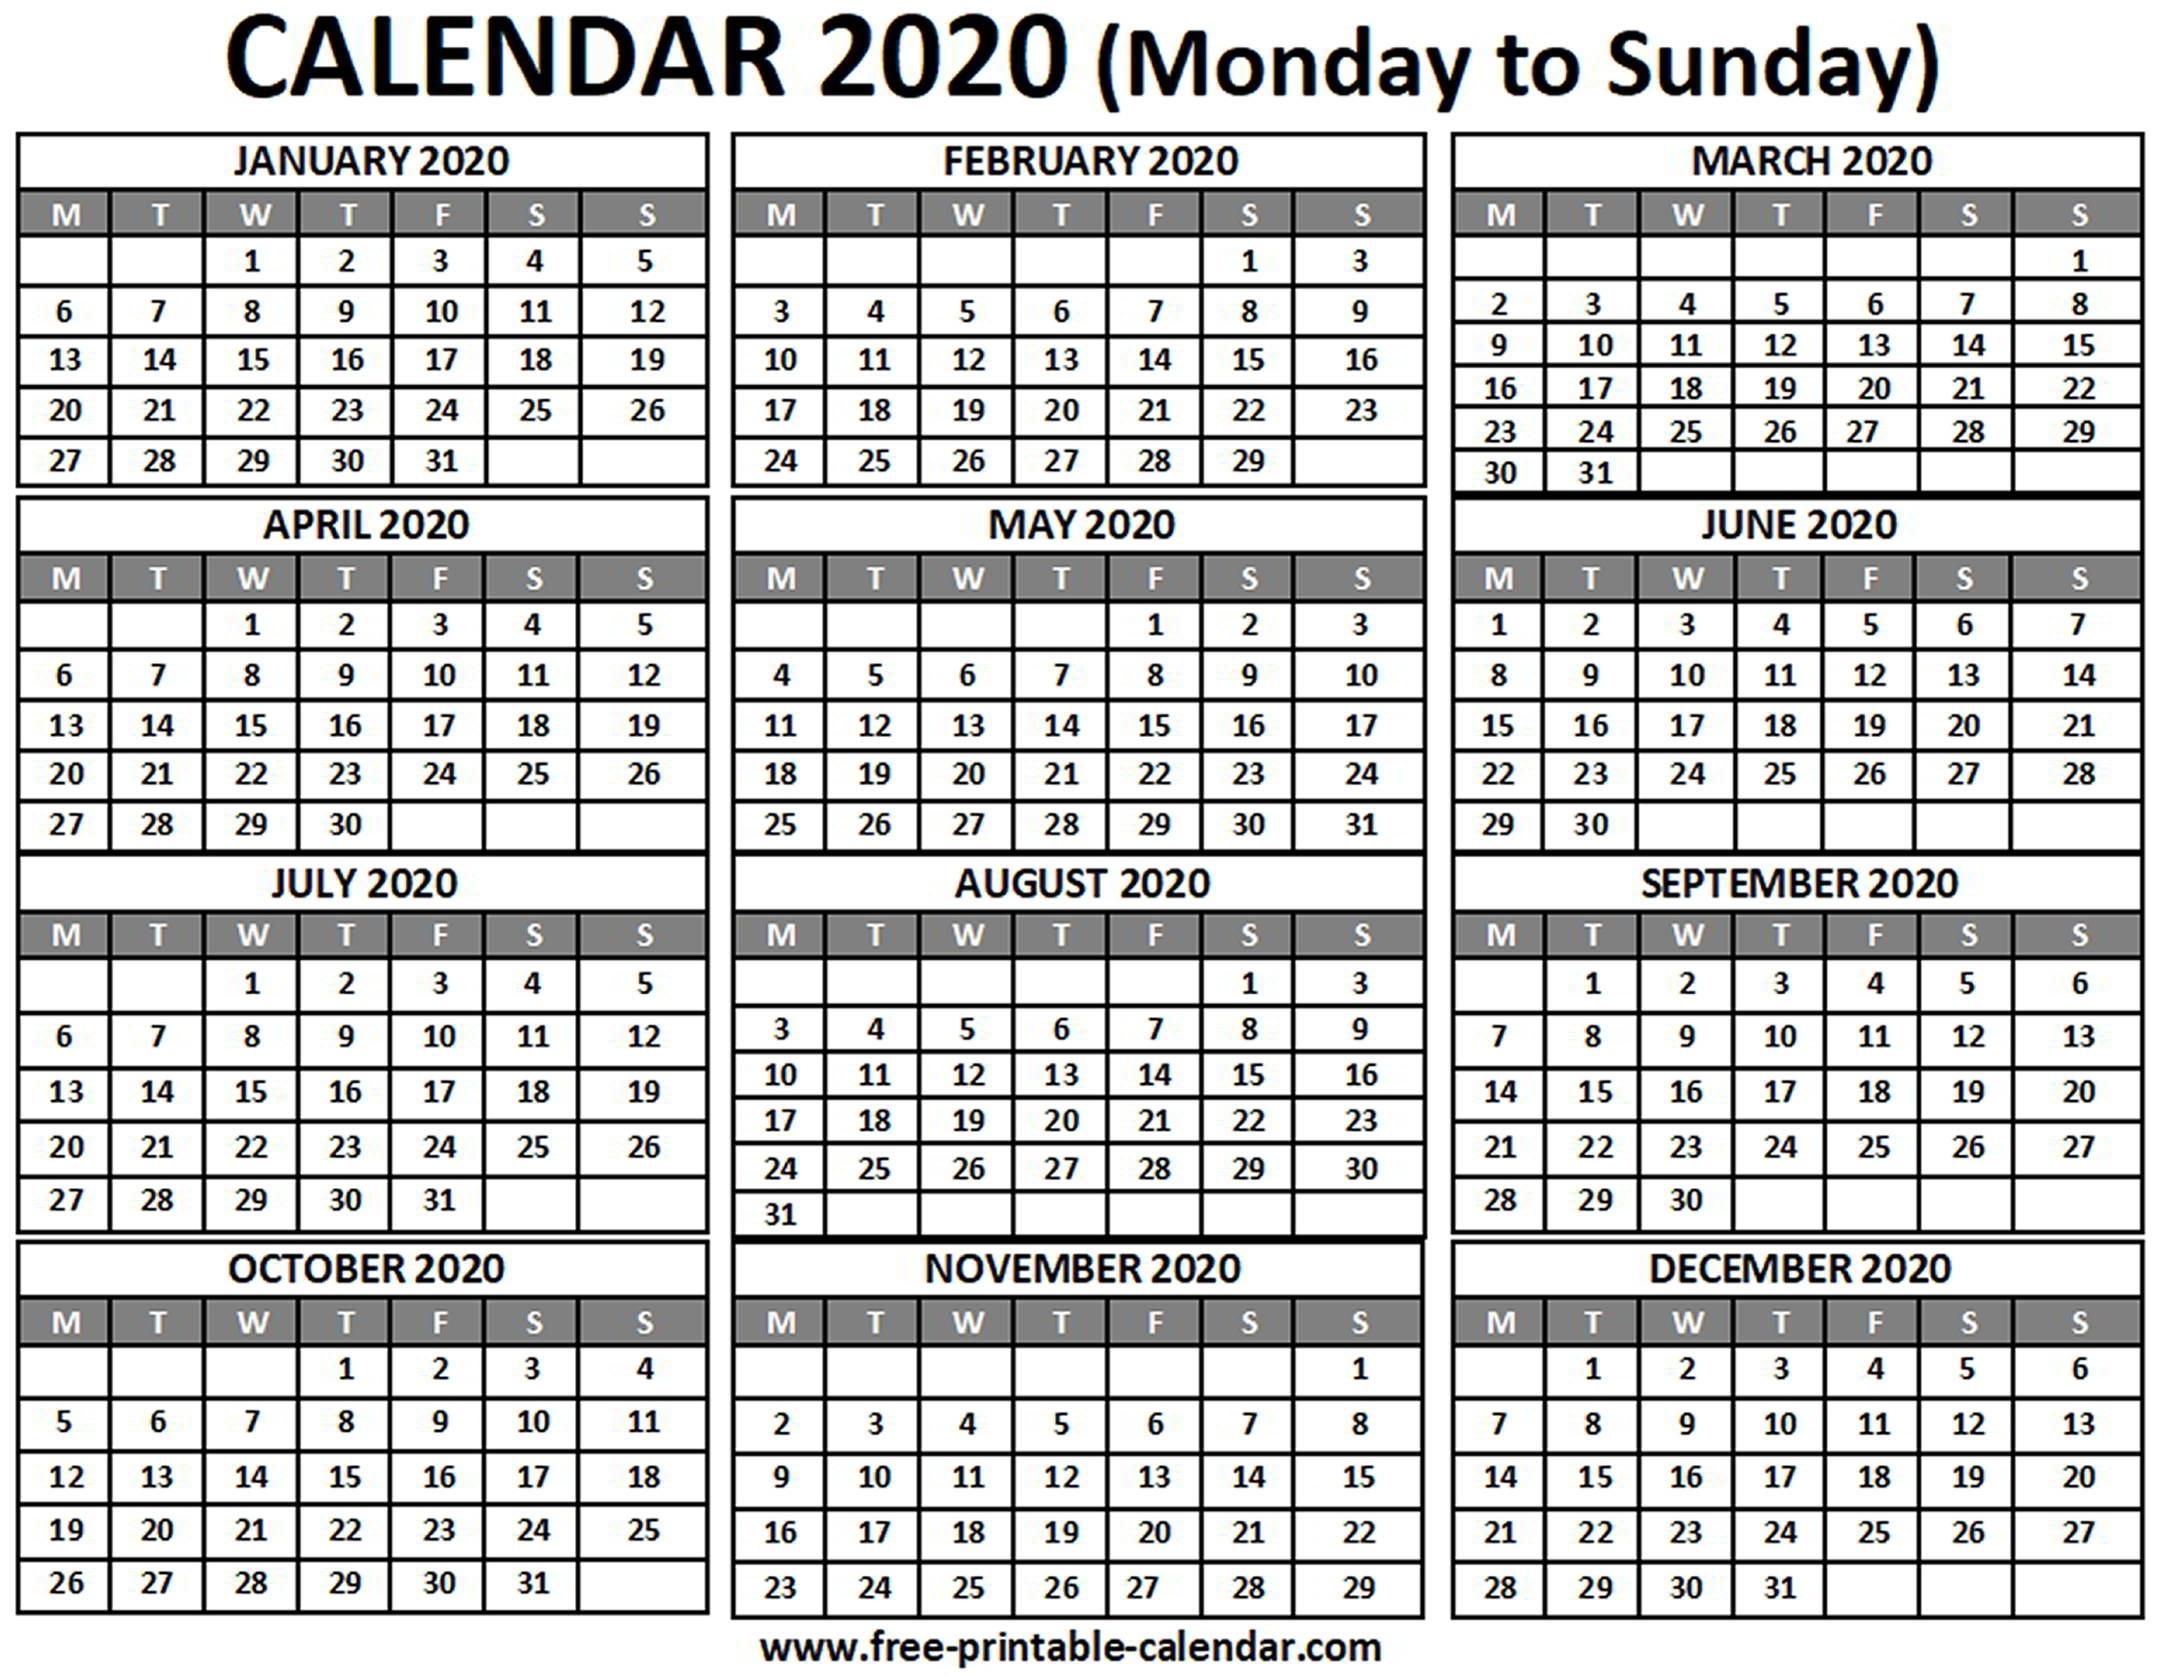 2020 Calendar - Free-Printable-Calendar within Monday - Sunday 2020